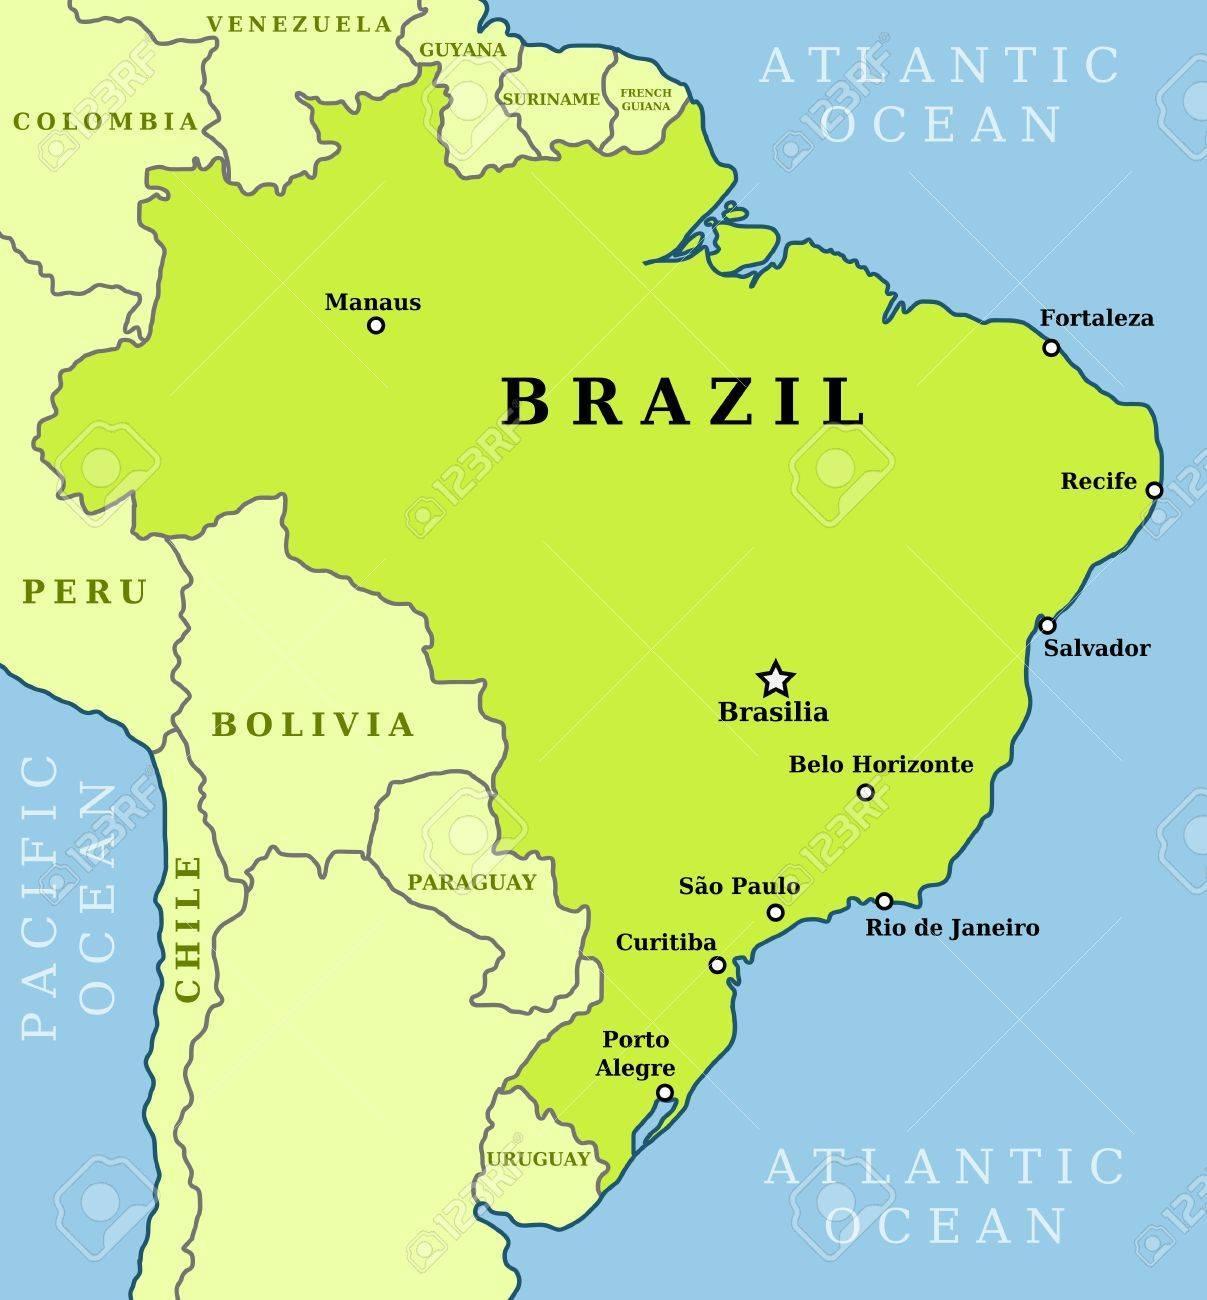 brasil kart Kart over Brasil byer   Brasil kart over byer (Sør Amerika   Amerika) brasil kart